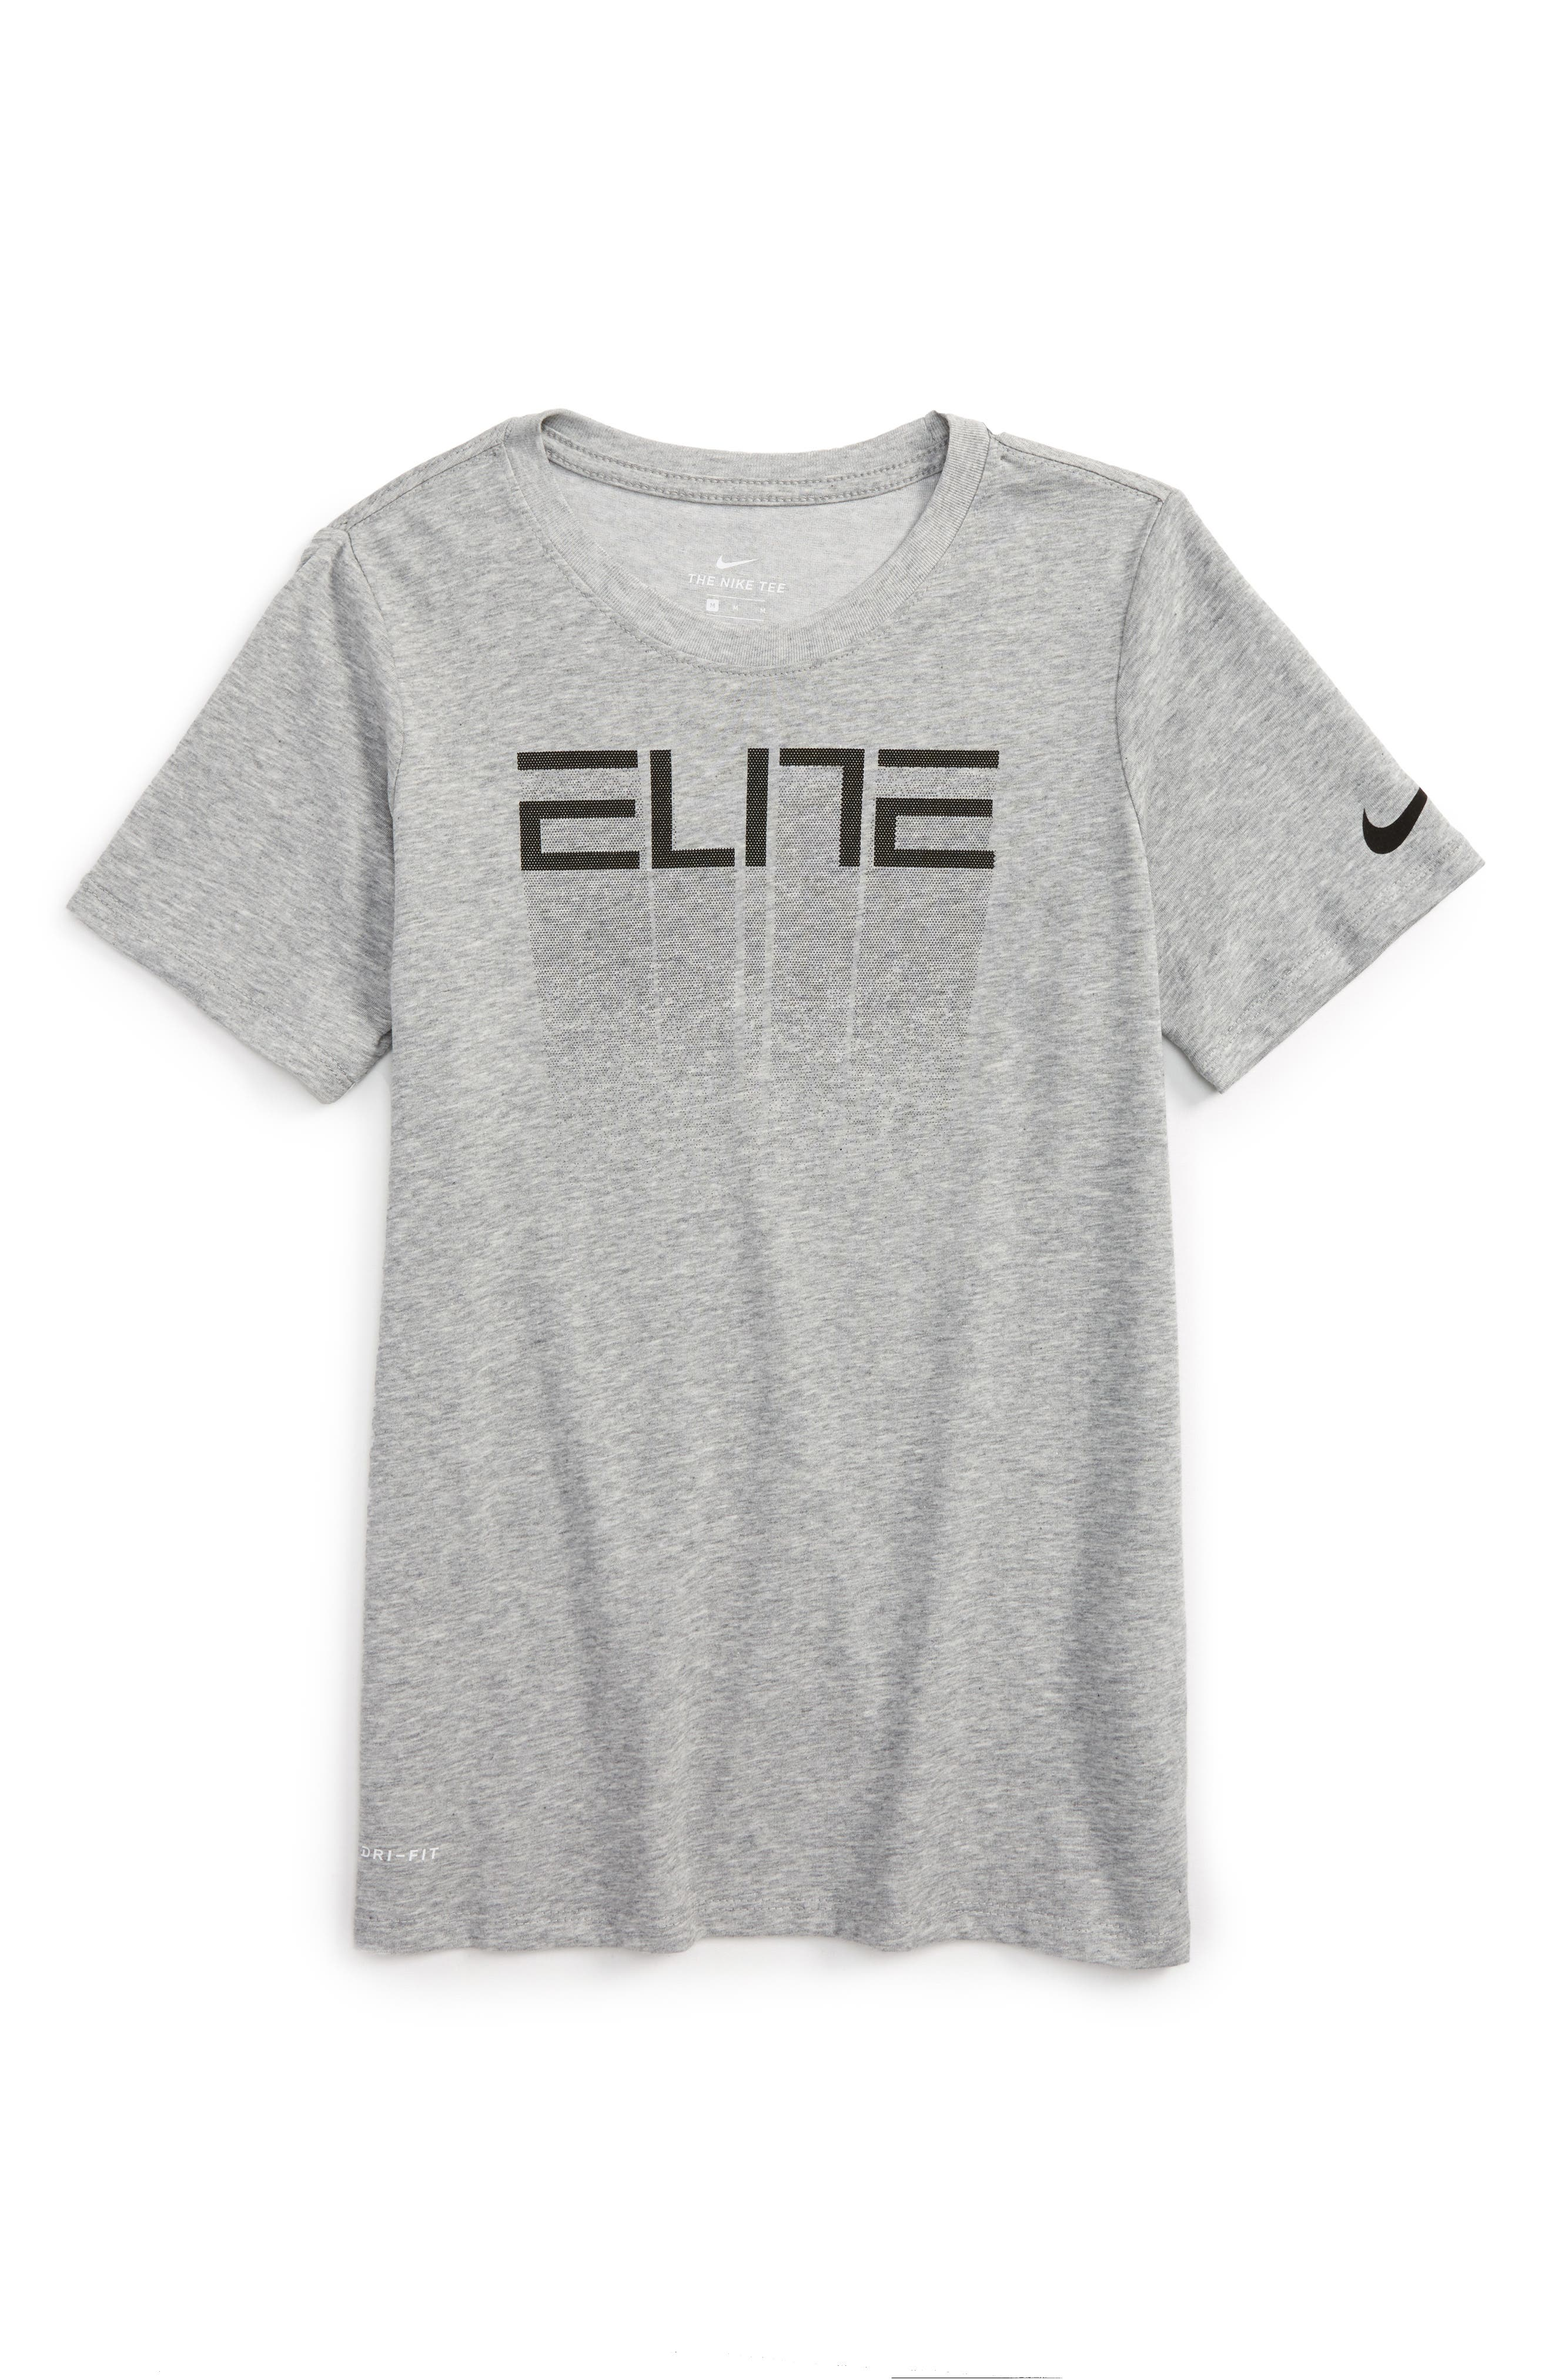 Main Image - Nike Dry Elite Fade Away Graphic T-Shirt